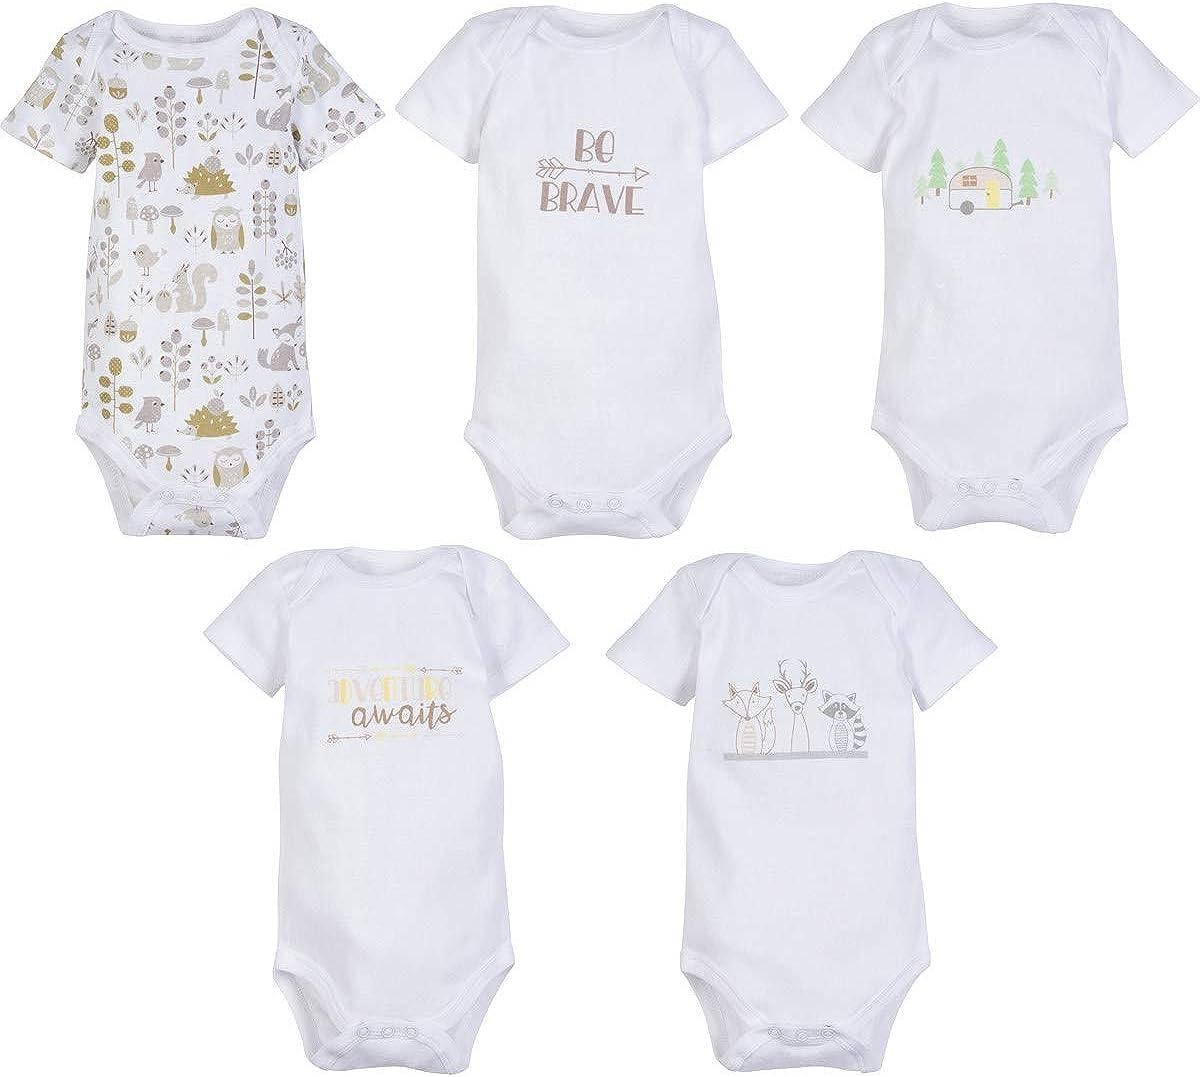 MiracleWear Cute Kid's Bodysuit Outfits (5-Pack) Baby Boy & Neutral Unisex Daywear Print Clothing Sets